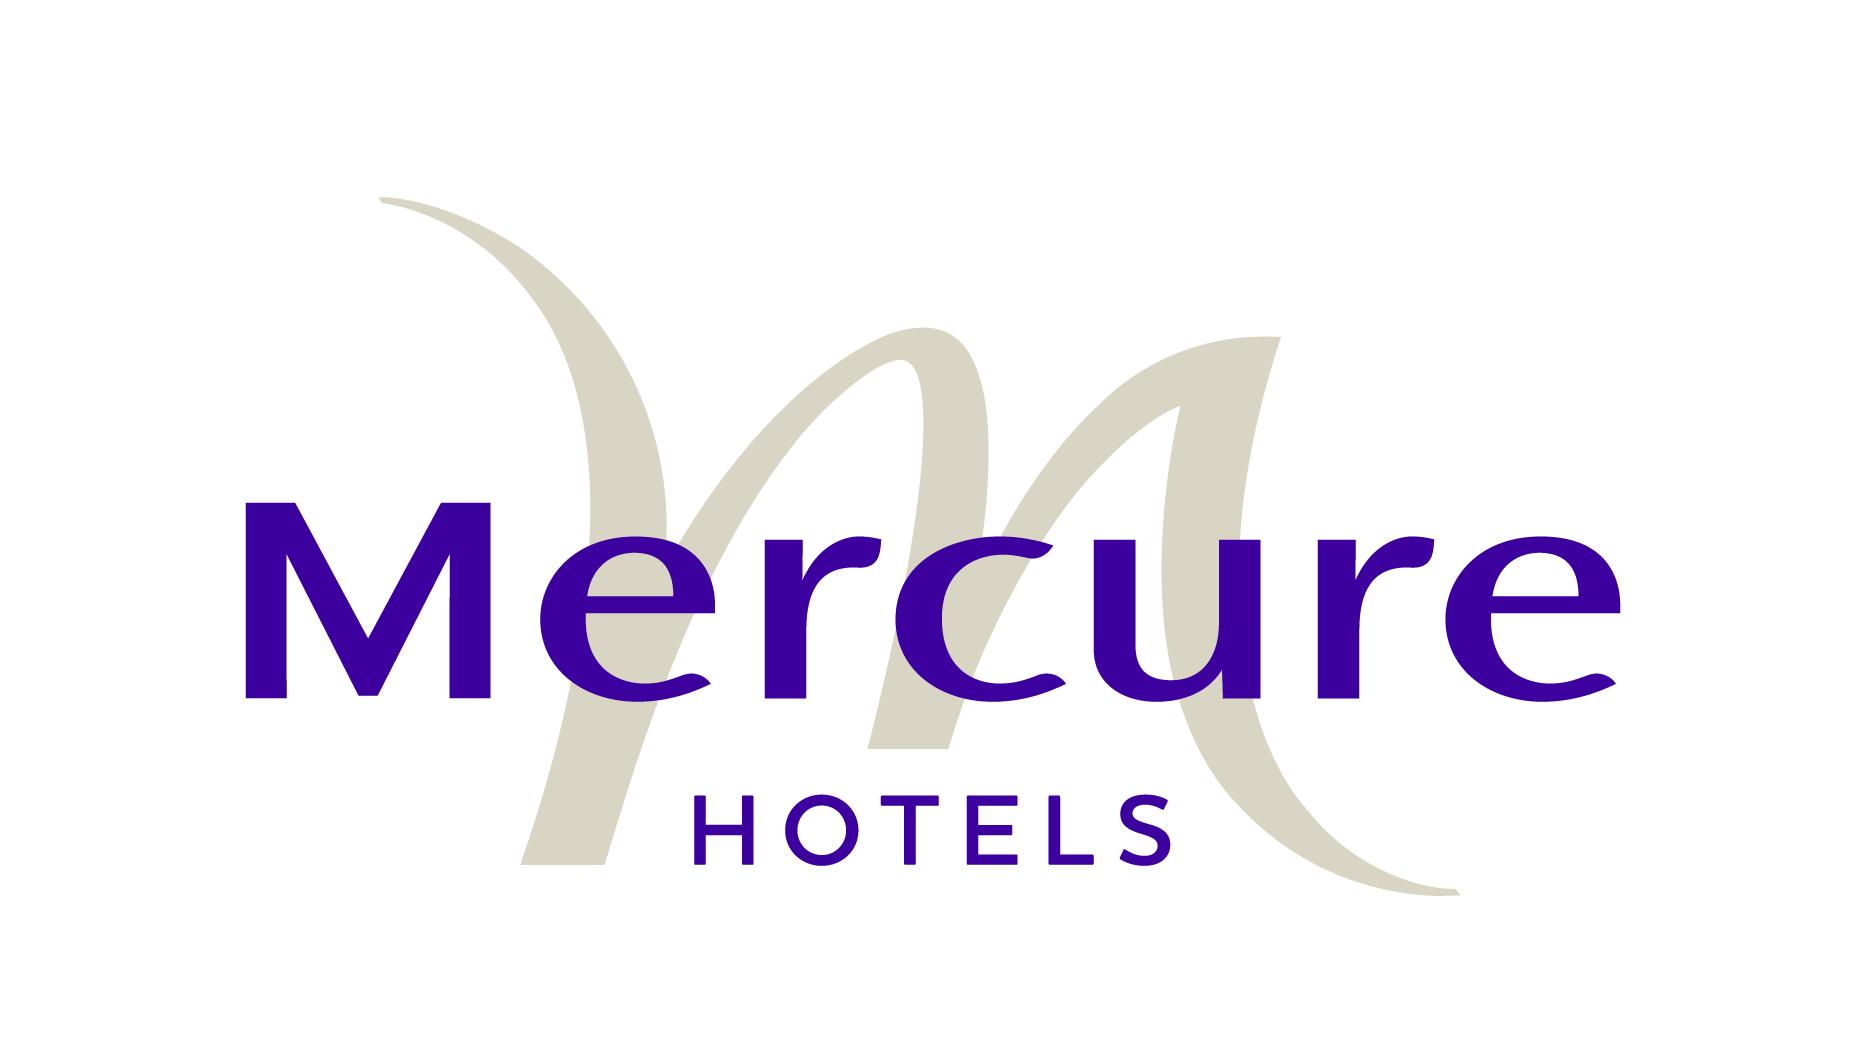 Mercure hotels cmjn.jpg